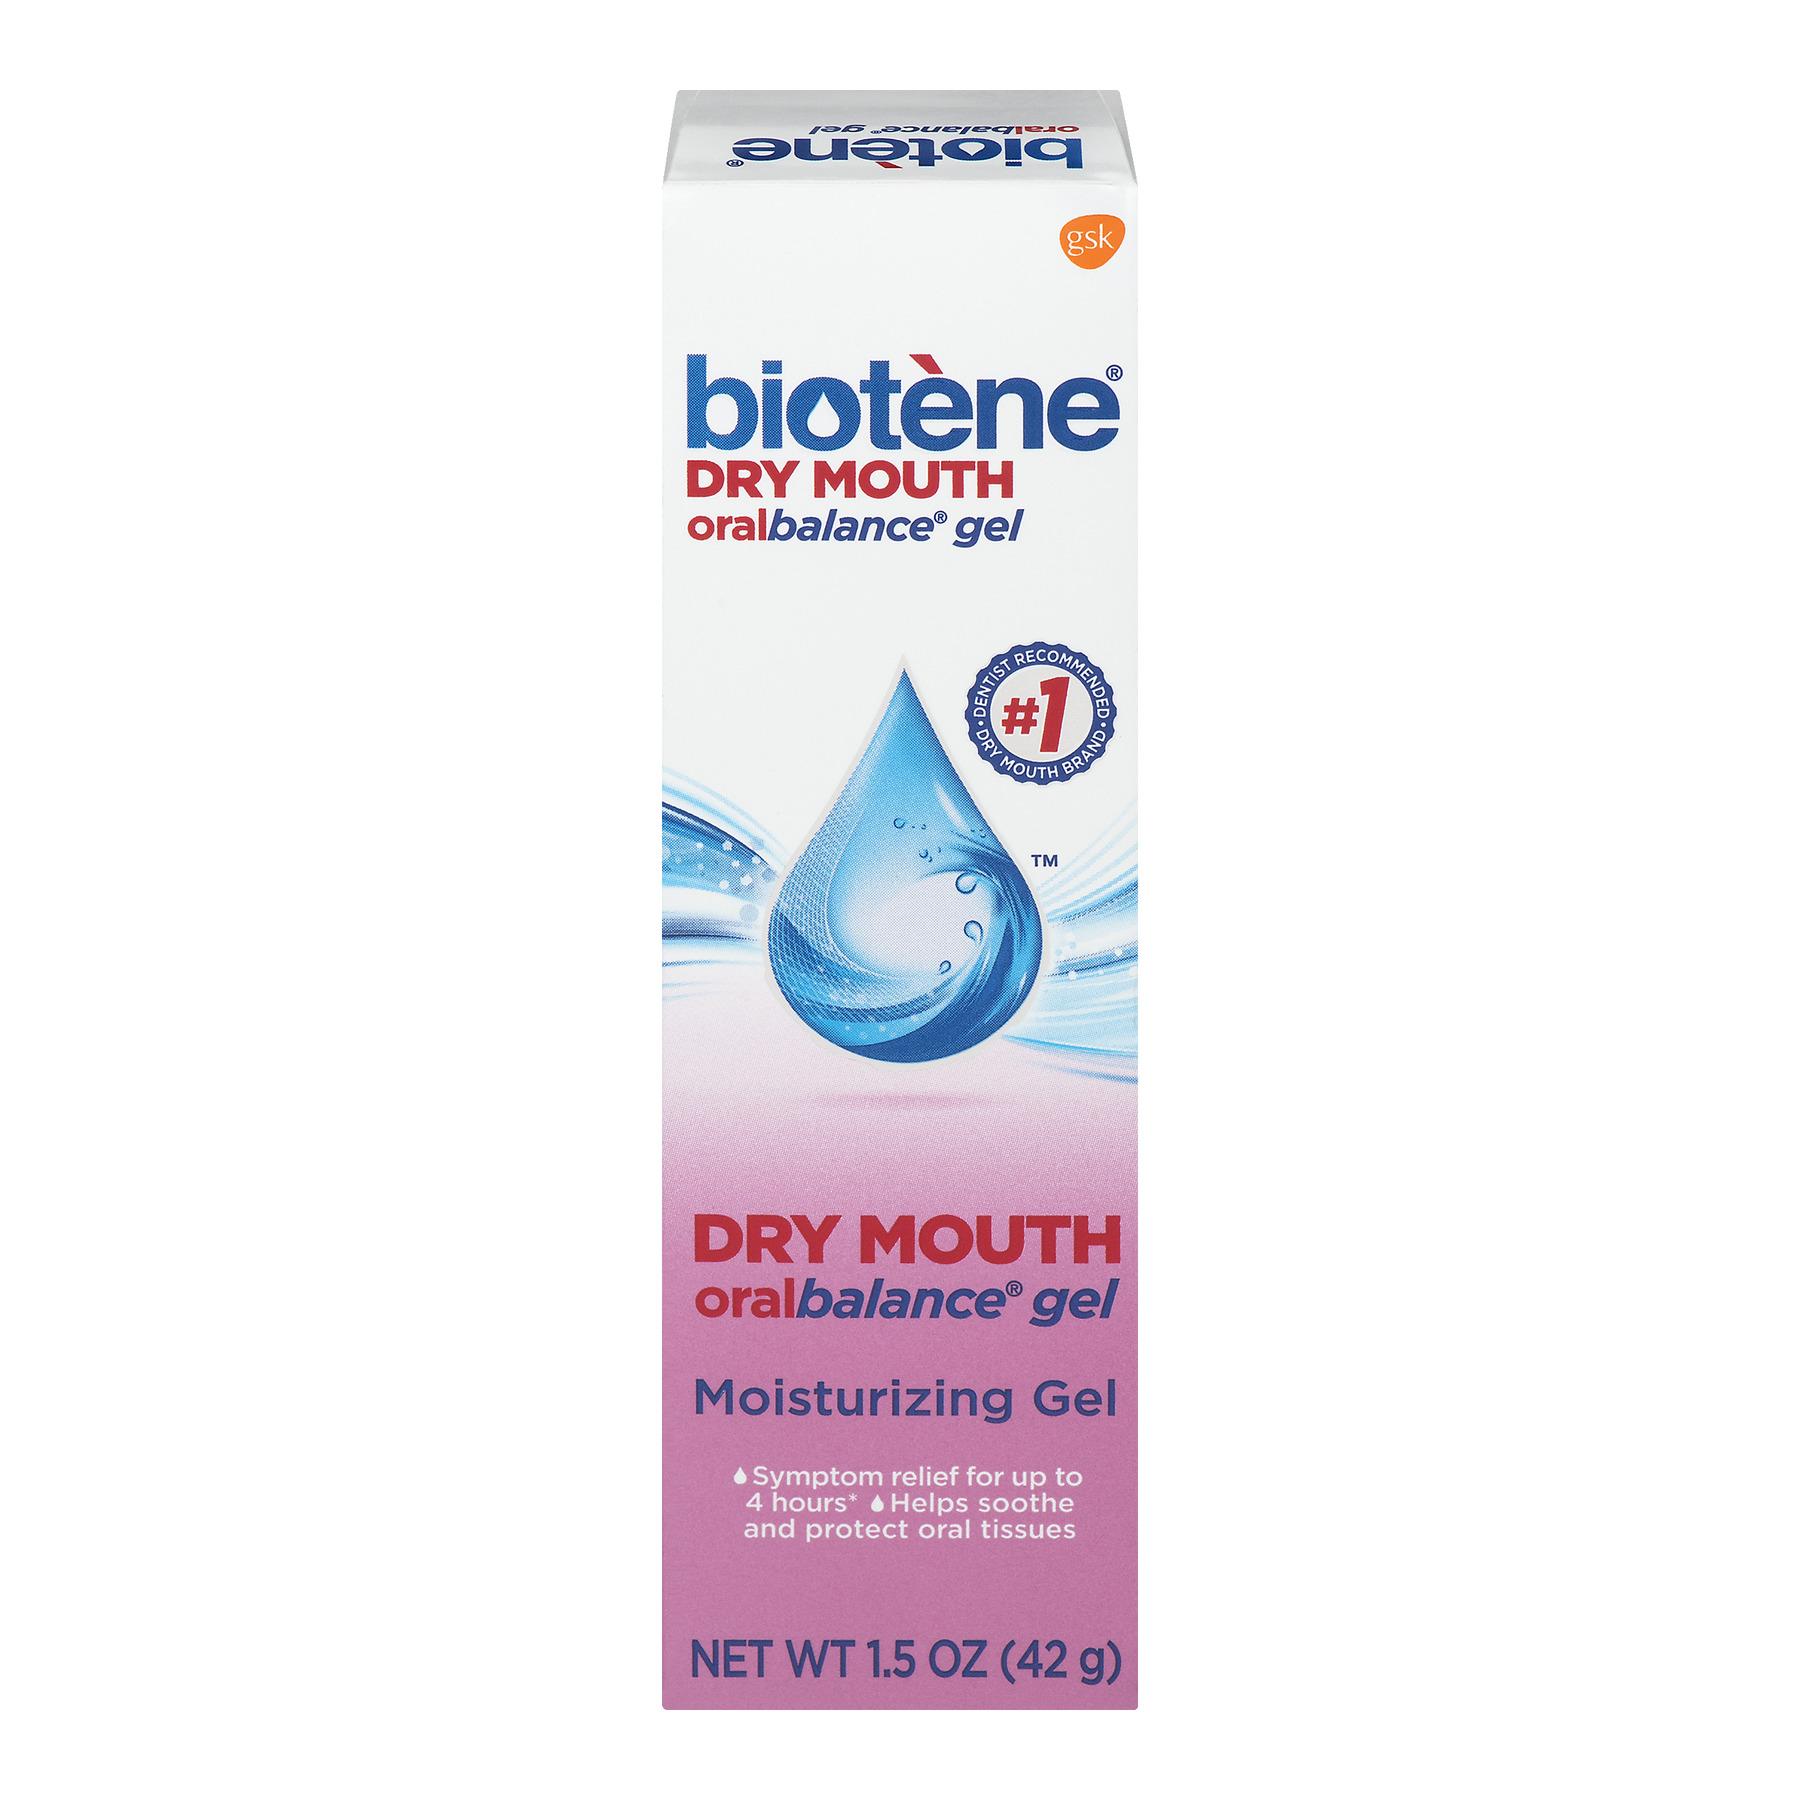 Biotene Dry Mouth Oral Balance Moisturizing Gel, 1.5 oz